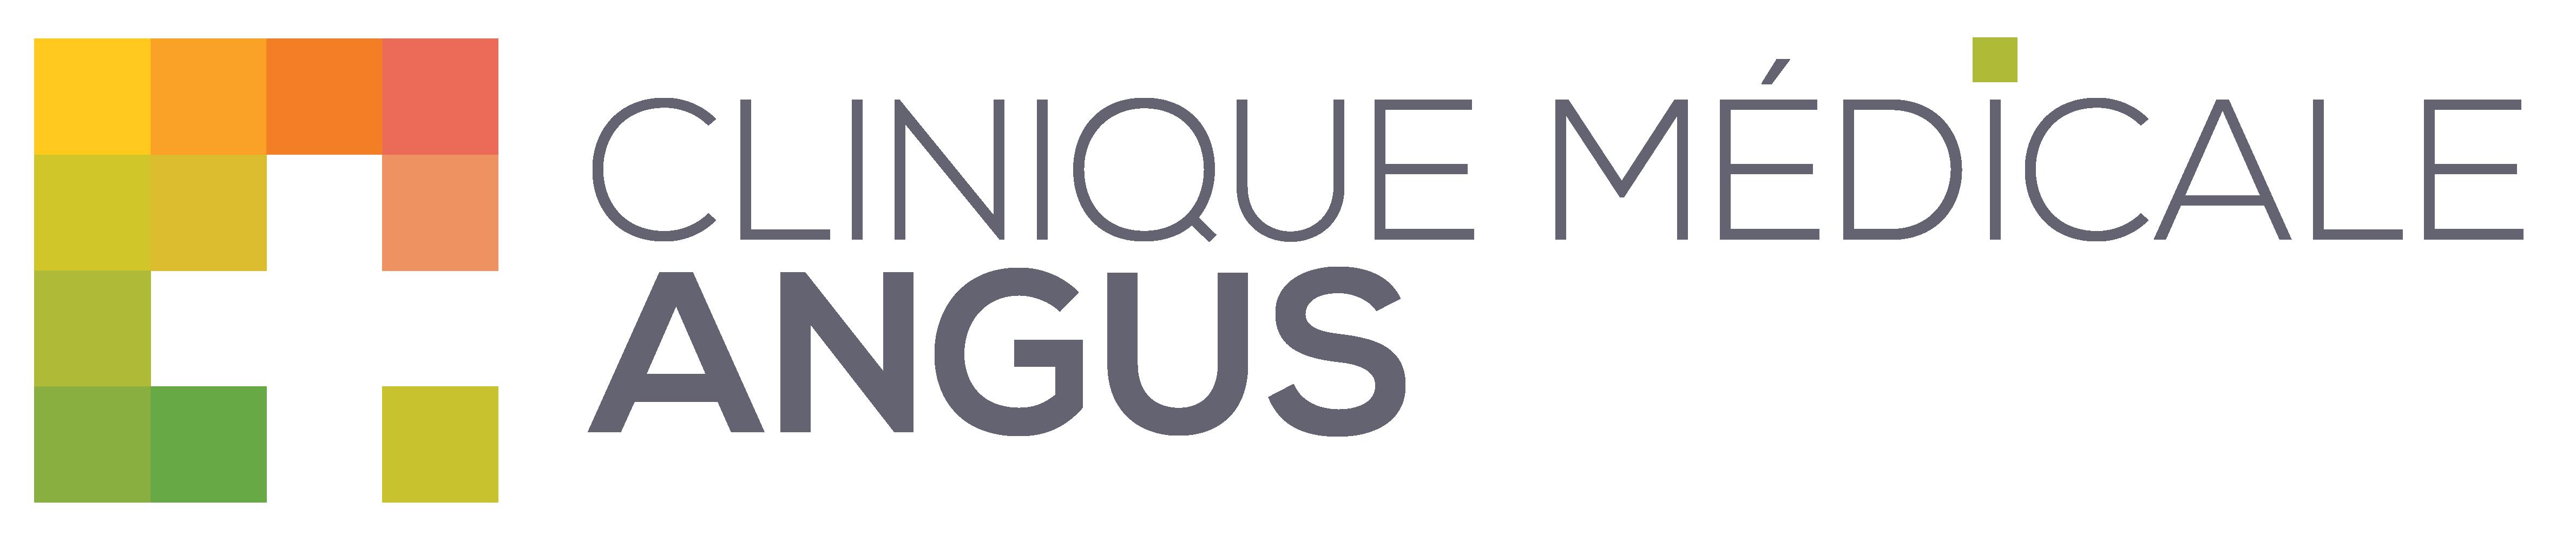 Fusium solutions, une division de Tootelo Innovation